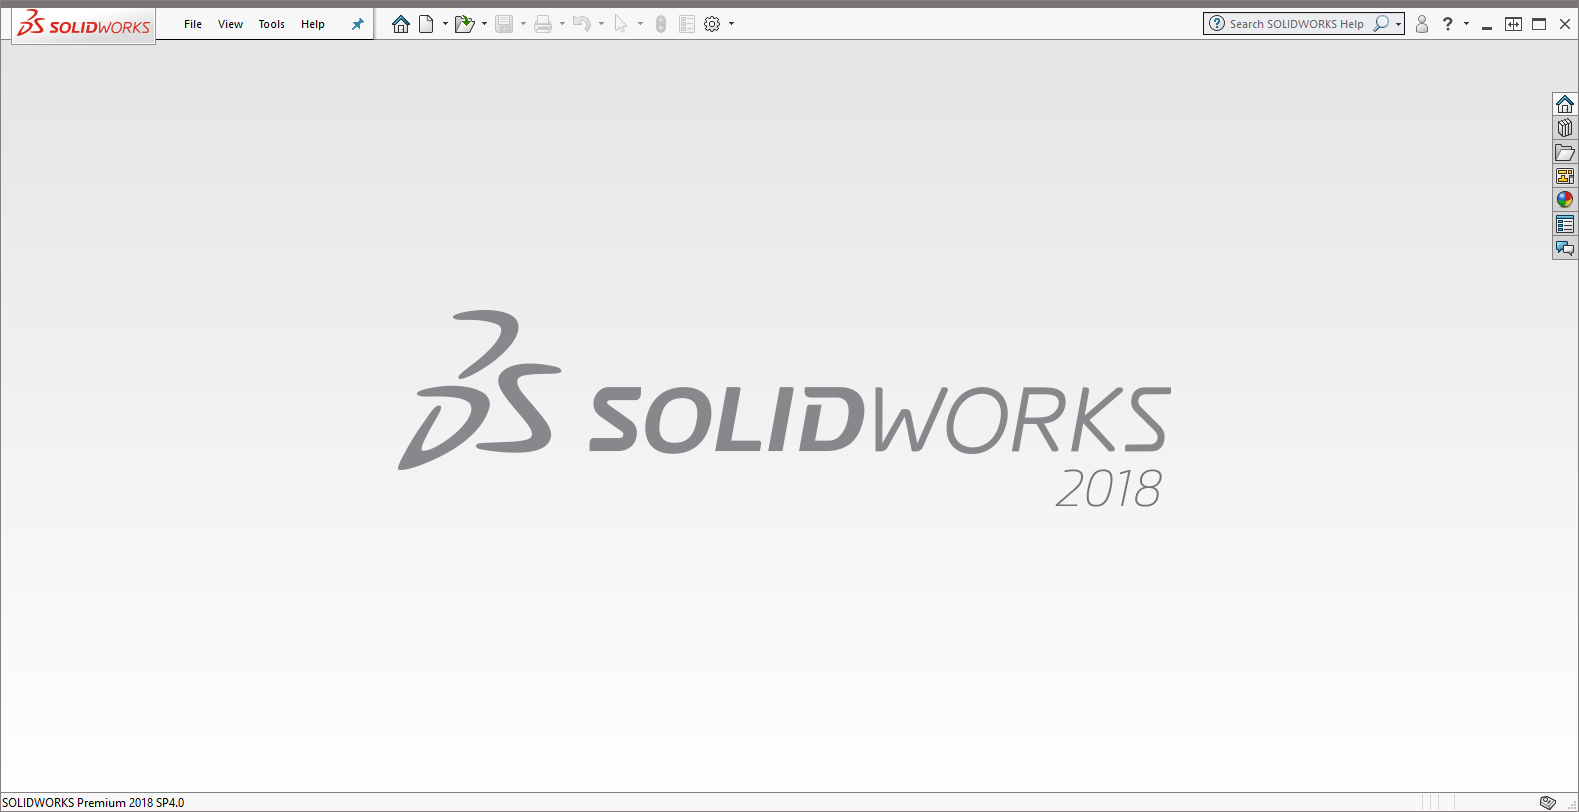 solidworks 2018 download with crack 64 bit torrent